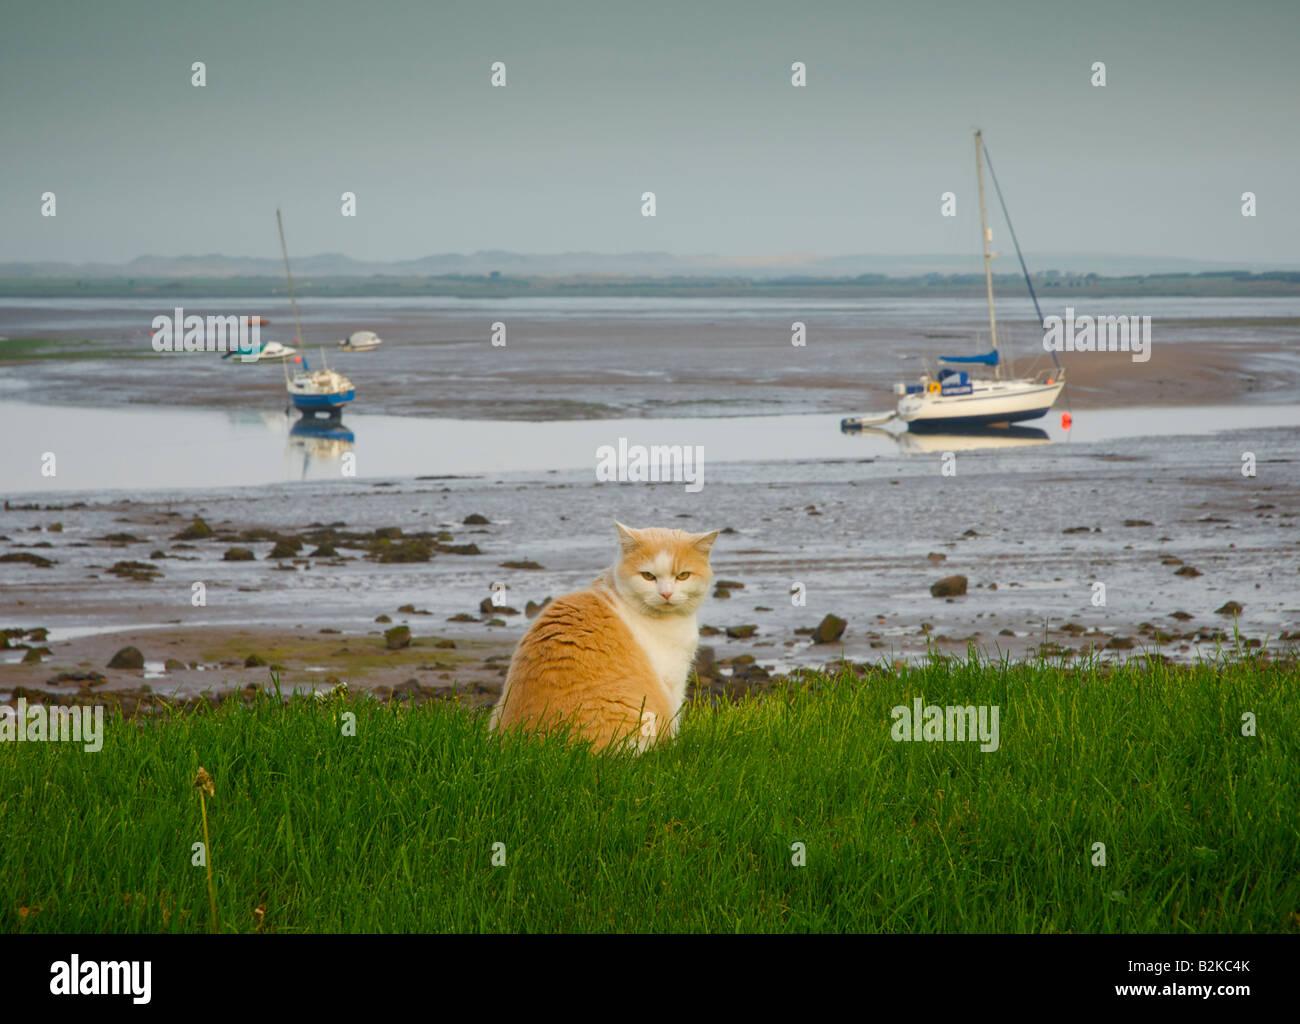 cat-sitting-on-grass-with-muddy-estuary-